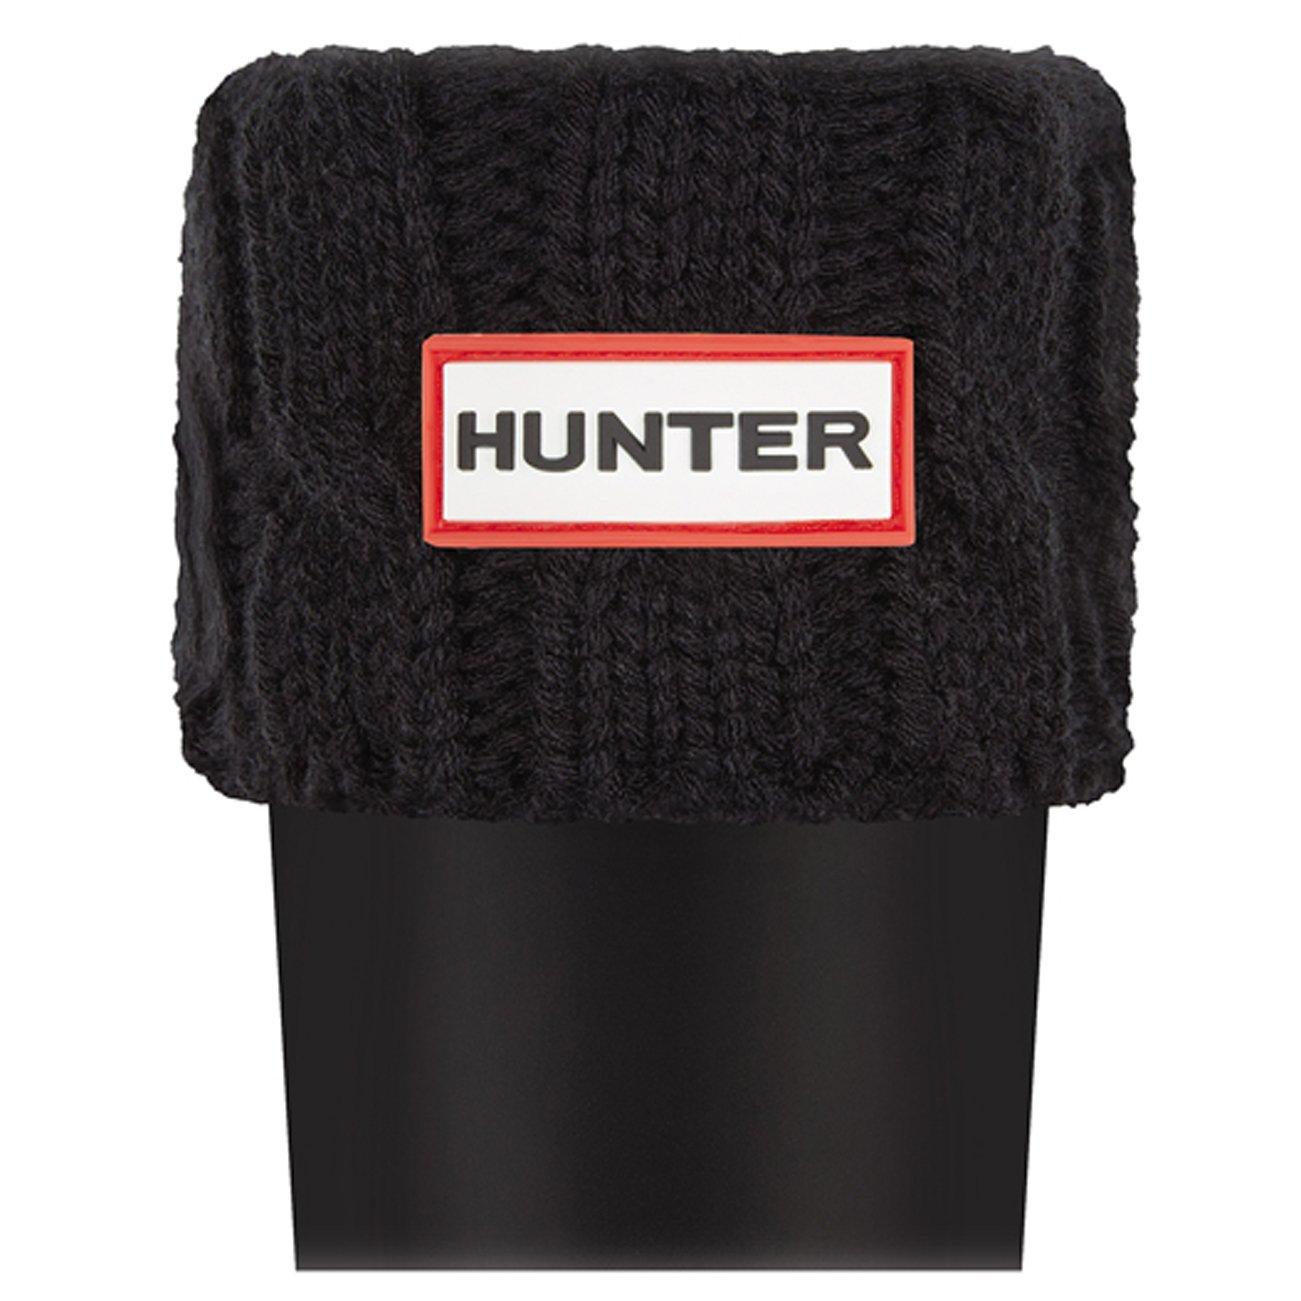 Unisex Adults Hunter 6 inch Cable Socks Original Tall Thermal Wellington B01JUP4AM4 11-13|Black